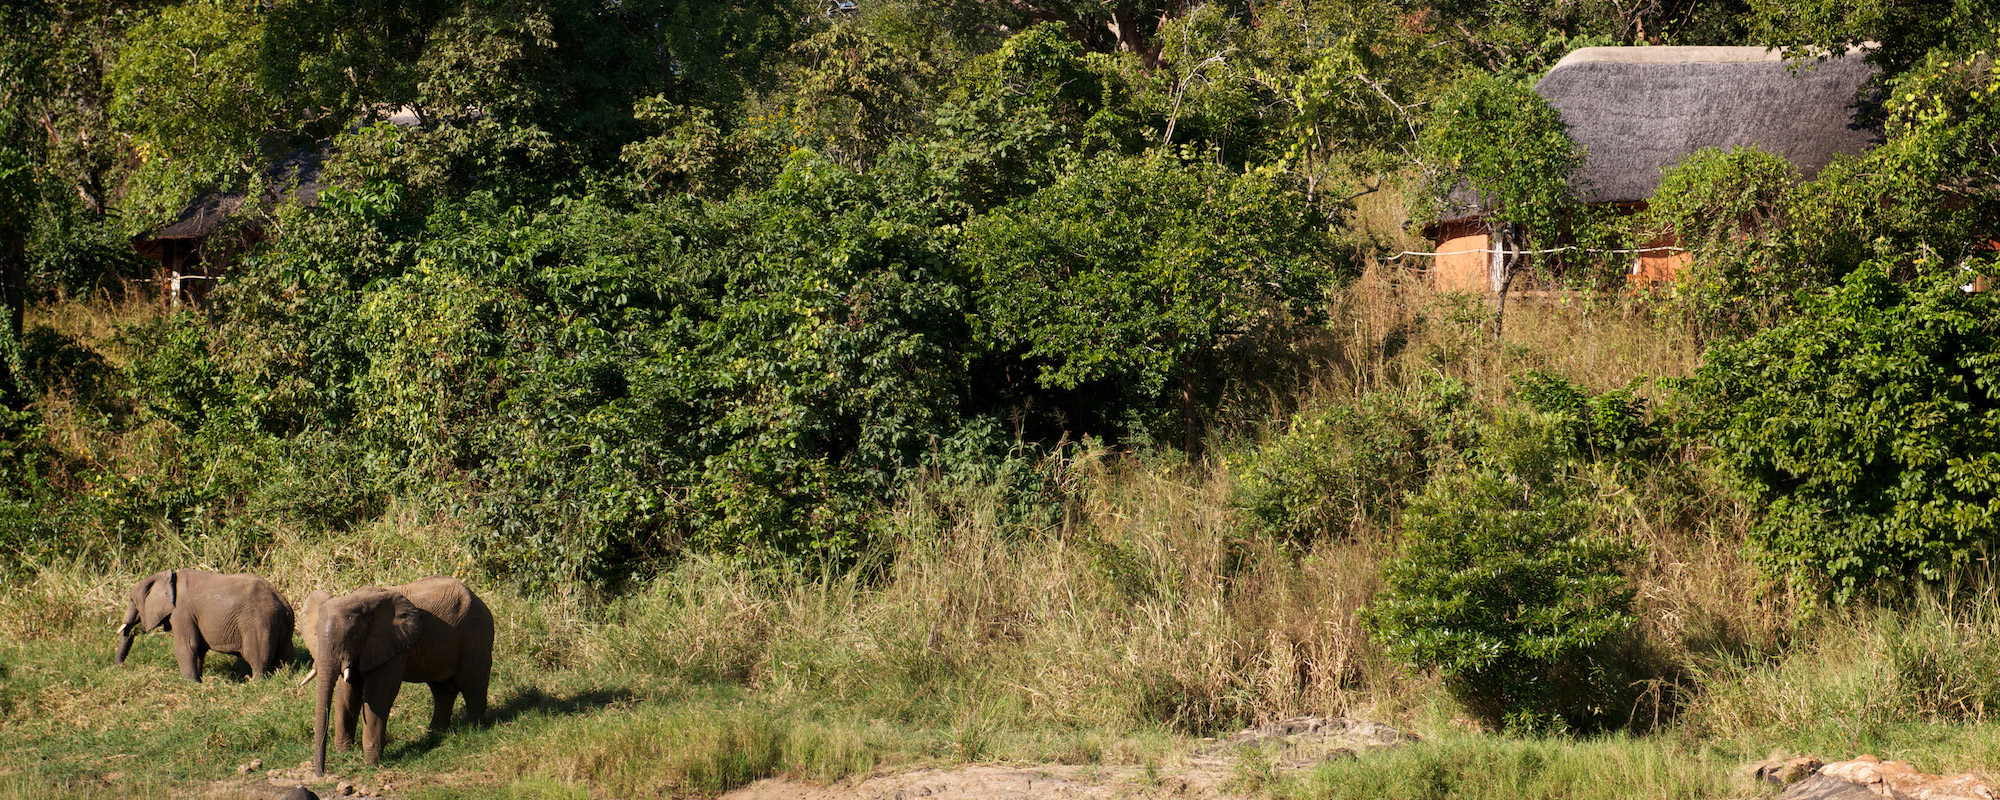 Tongole Wilderness Lodge - Wilderness Malawi Safari Elephants